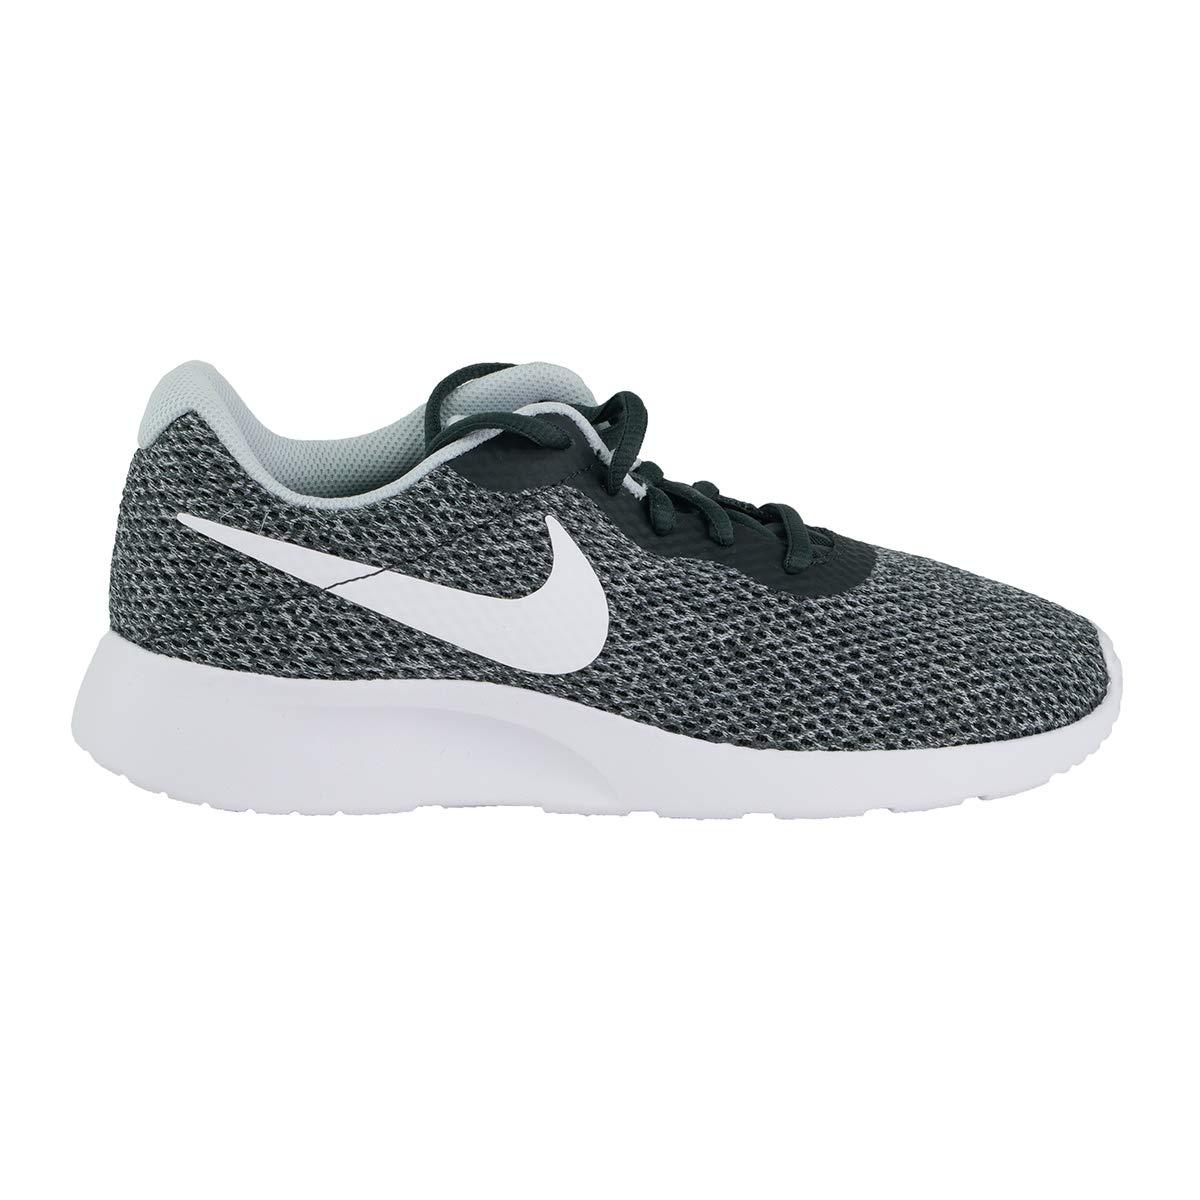 TALLA 5.5 B(M) US. Nike Tanjun, Zapatillas de Running para Mujer